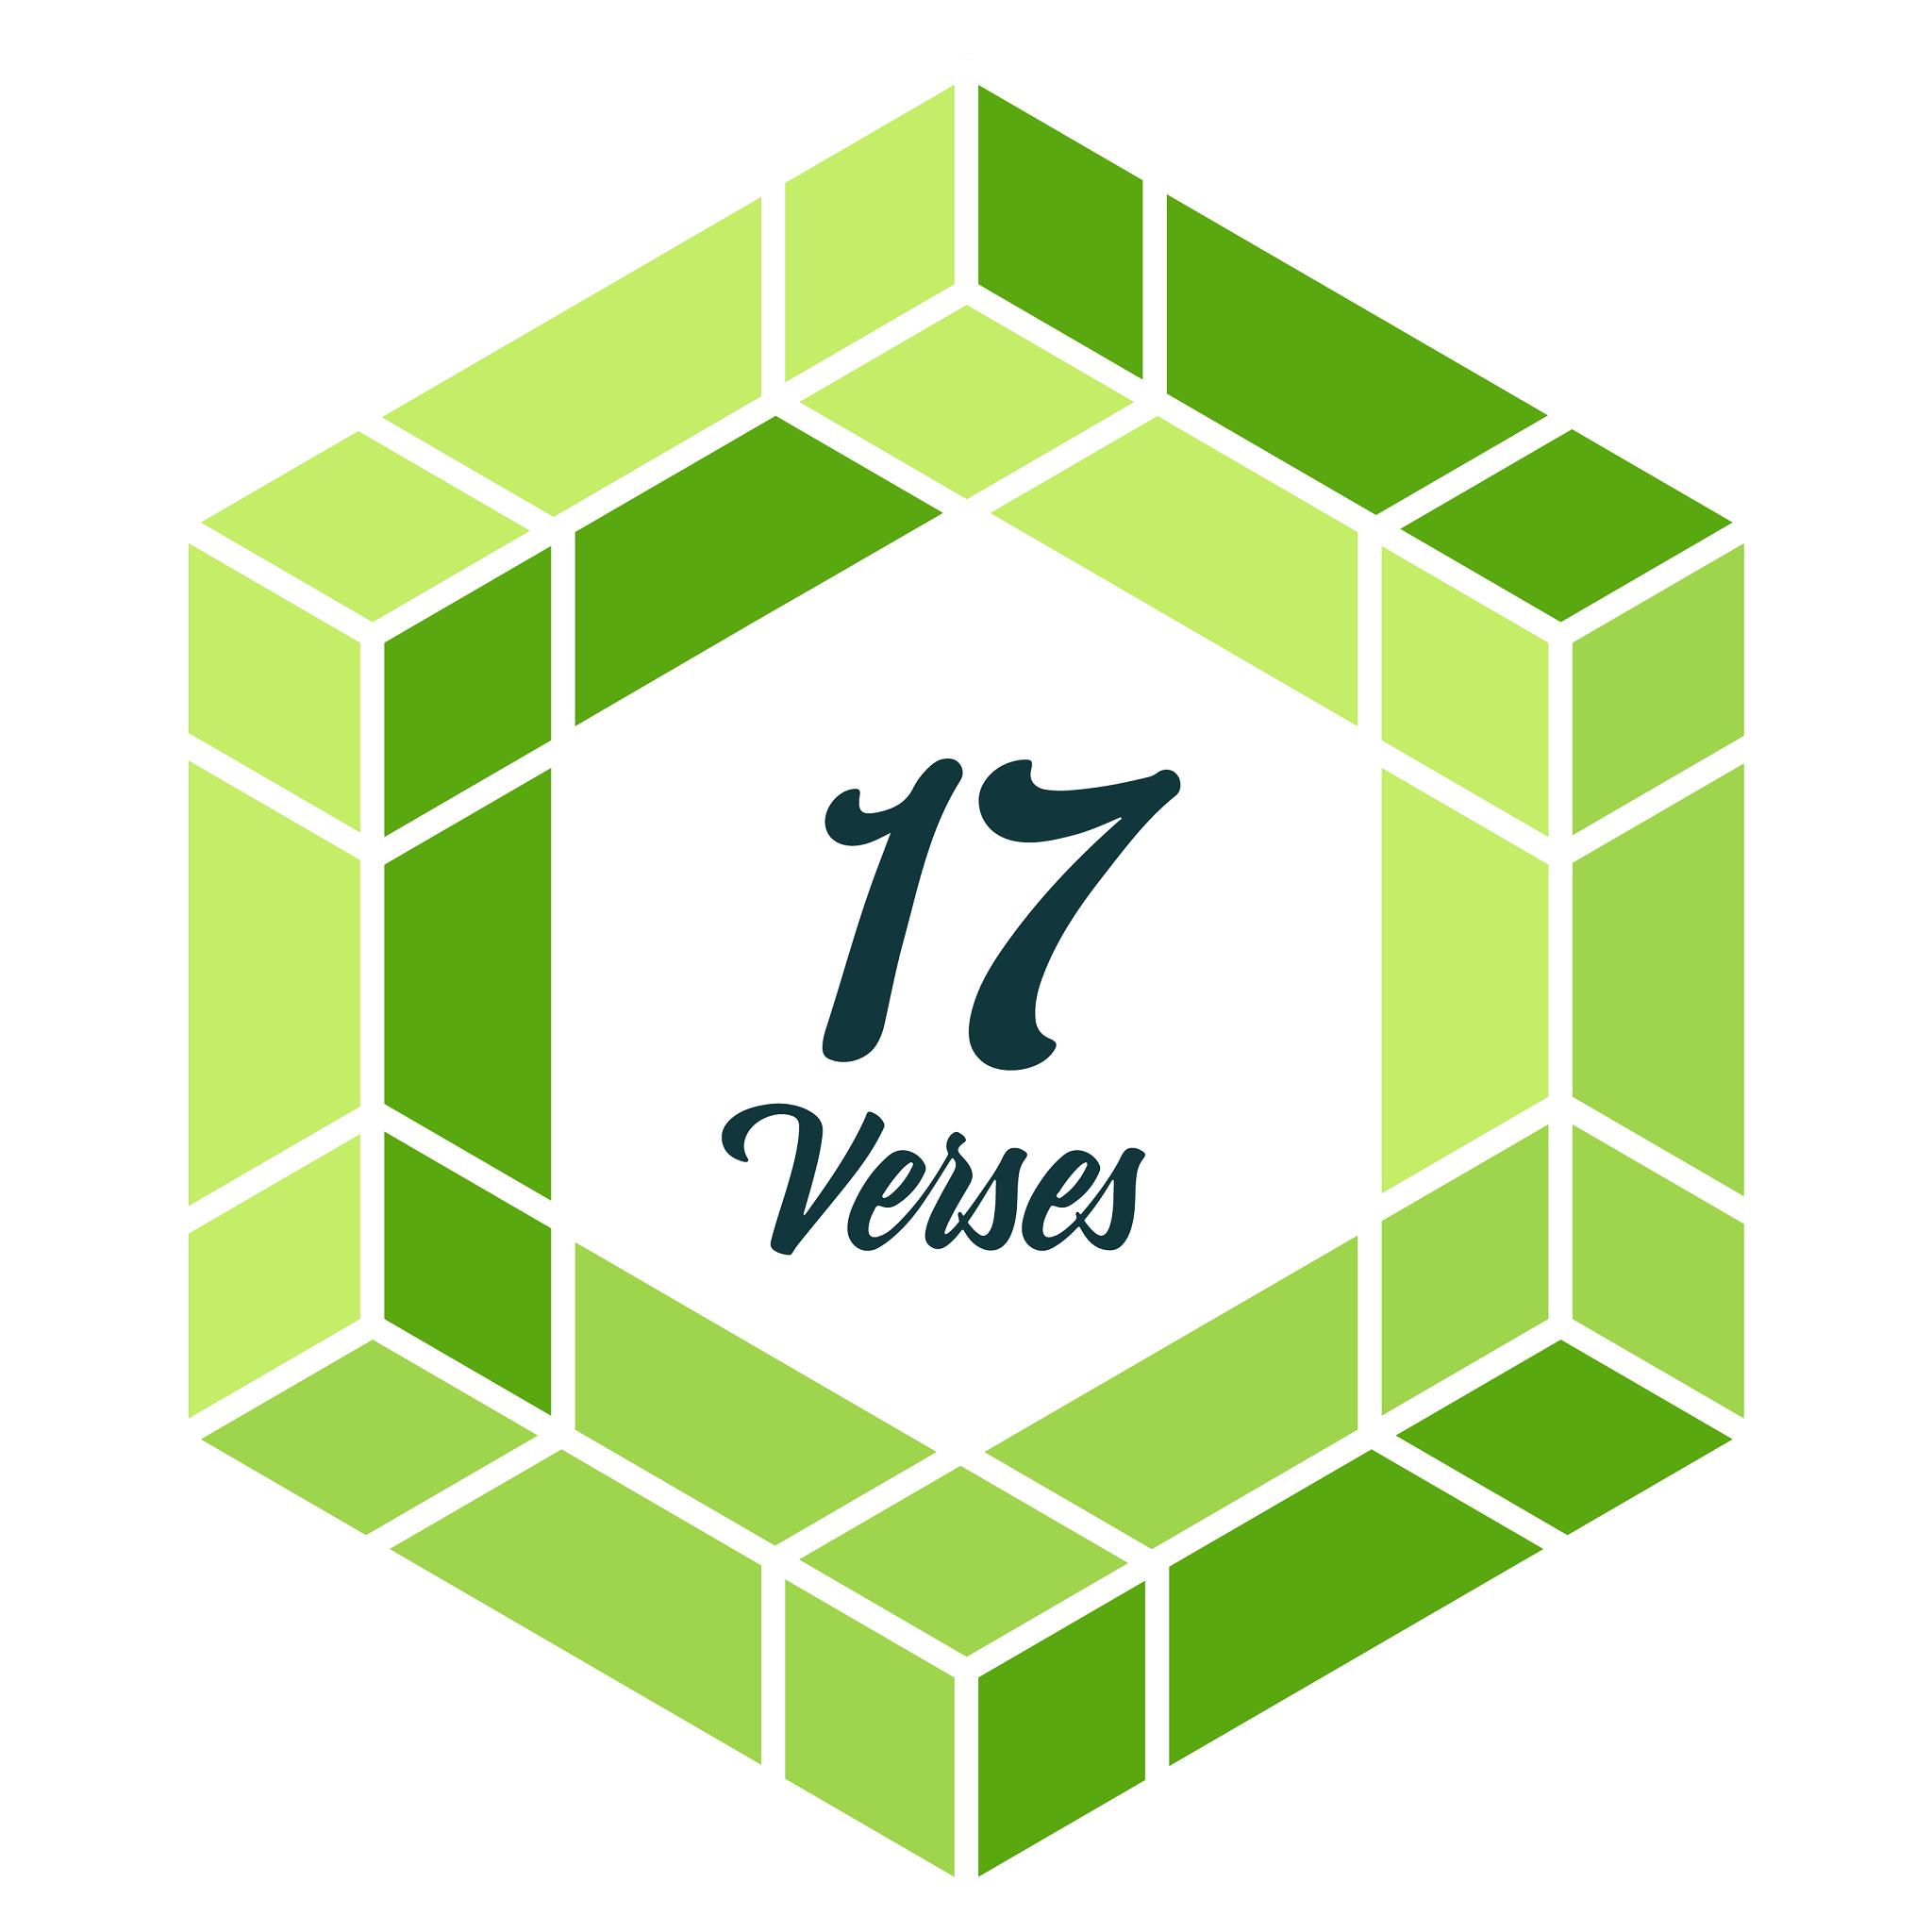 Year 2 - Surah 9 (At-Tauba), Verses 43-59